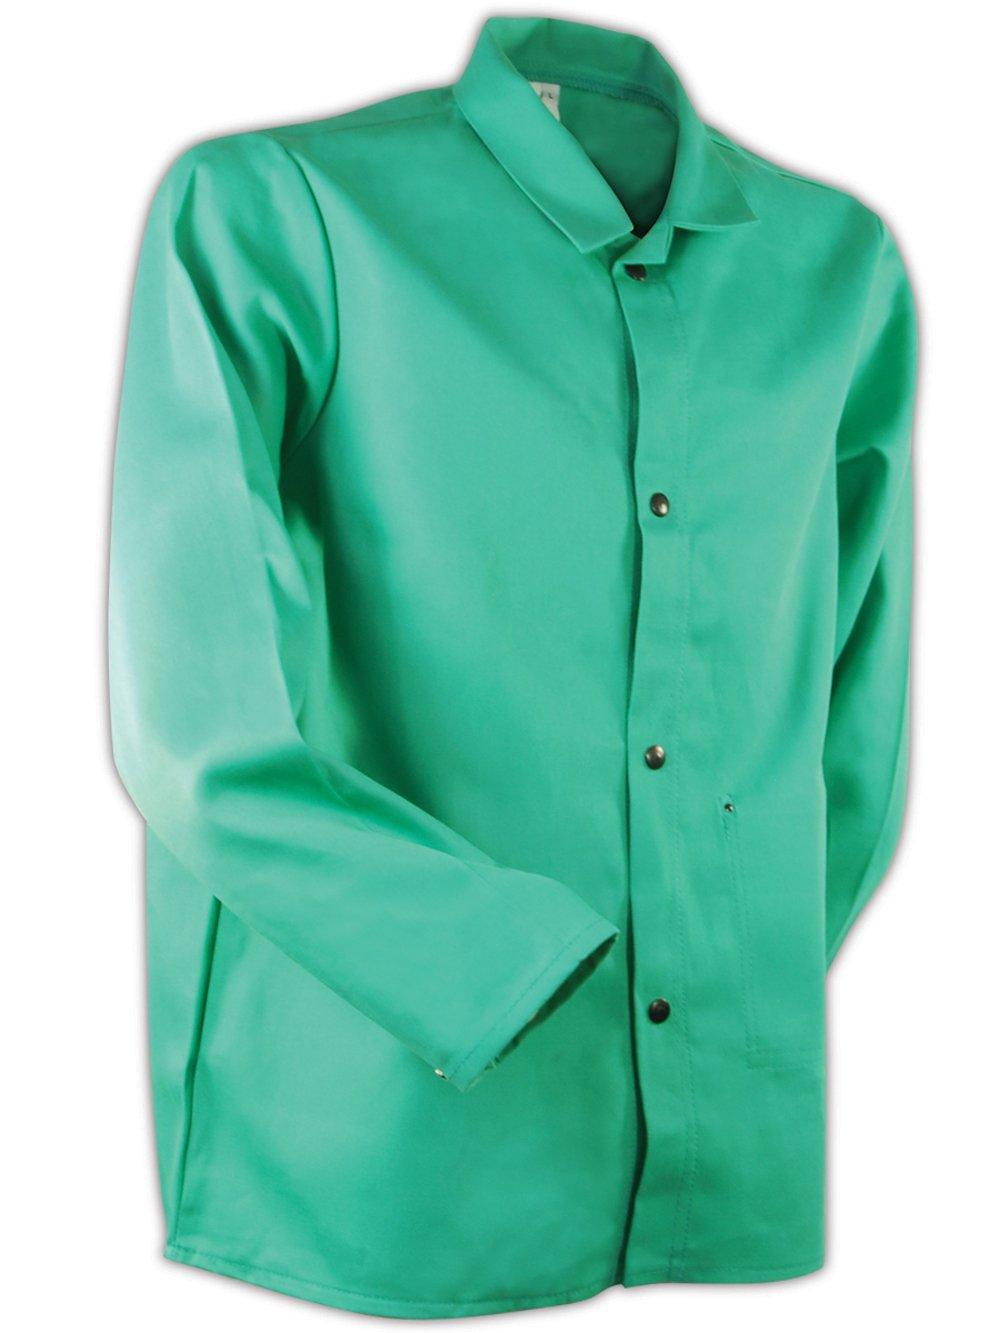 "Magid 1830XXXXXL SparkGuard Flame Resistant Cotton Standard Weight Jacket, 30"" Length, 5XL, Green"